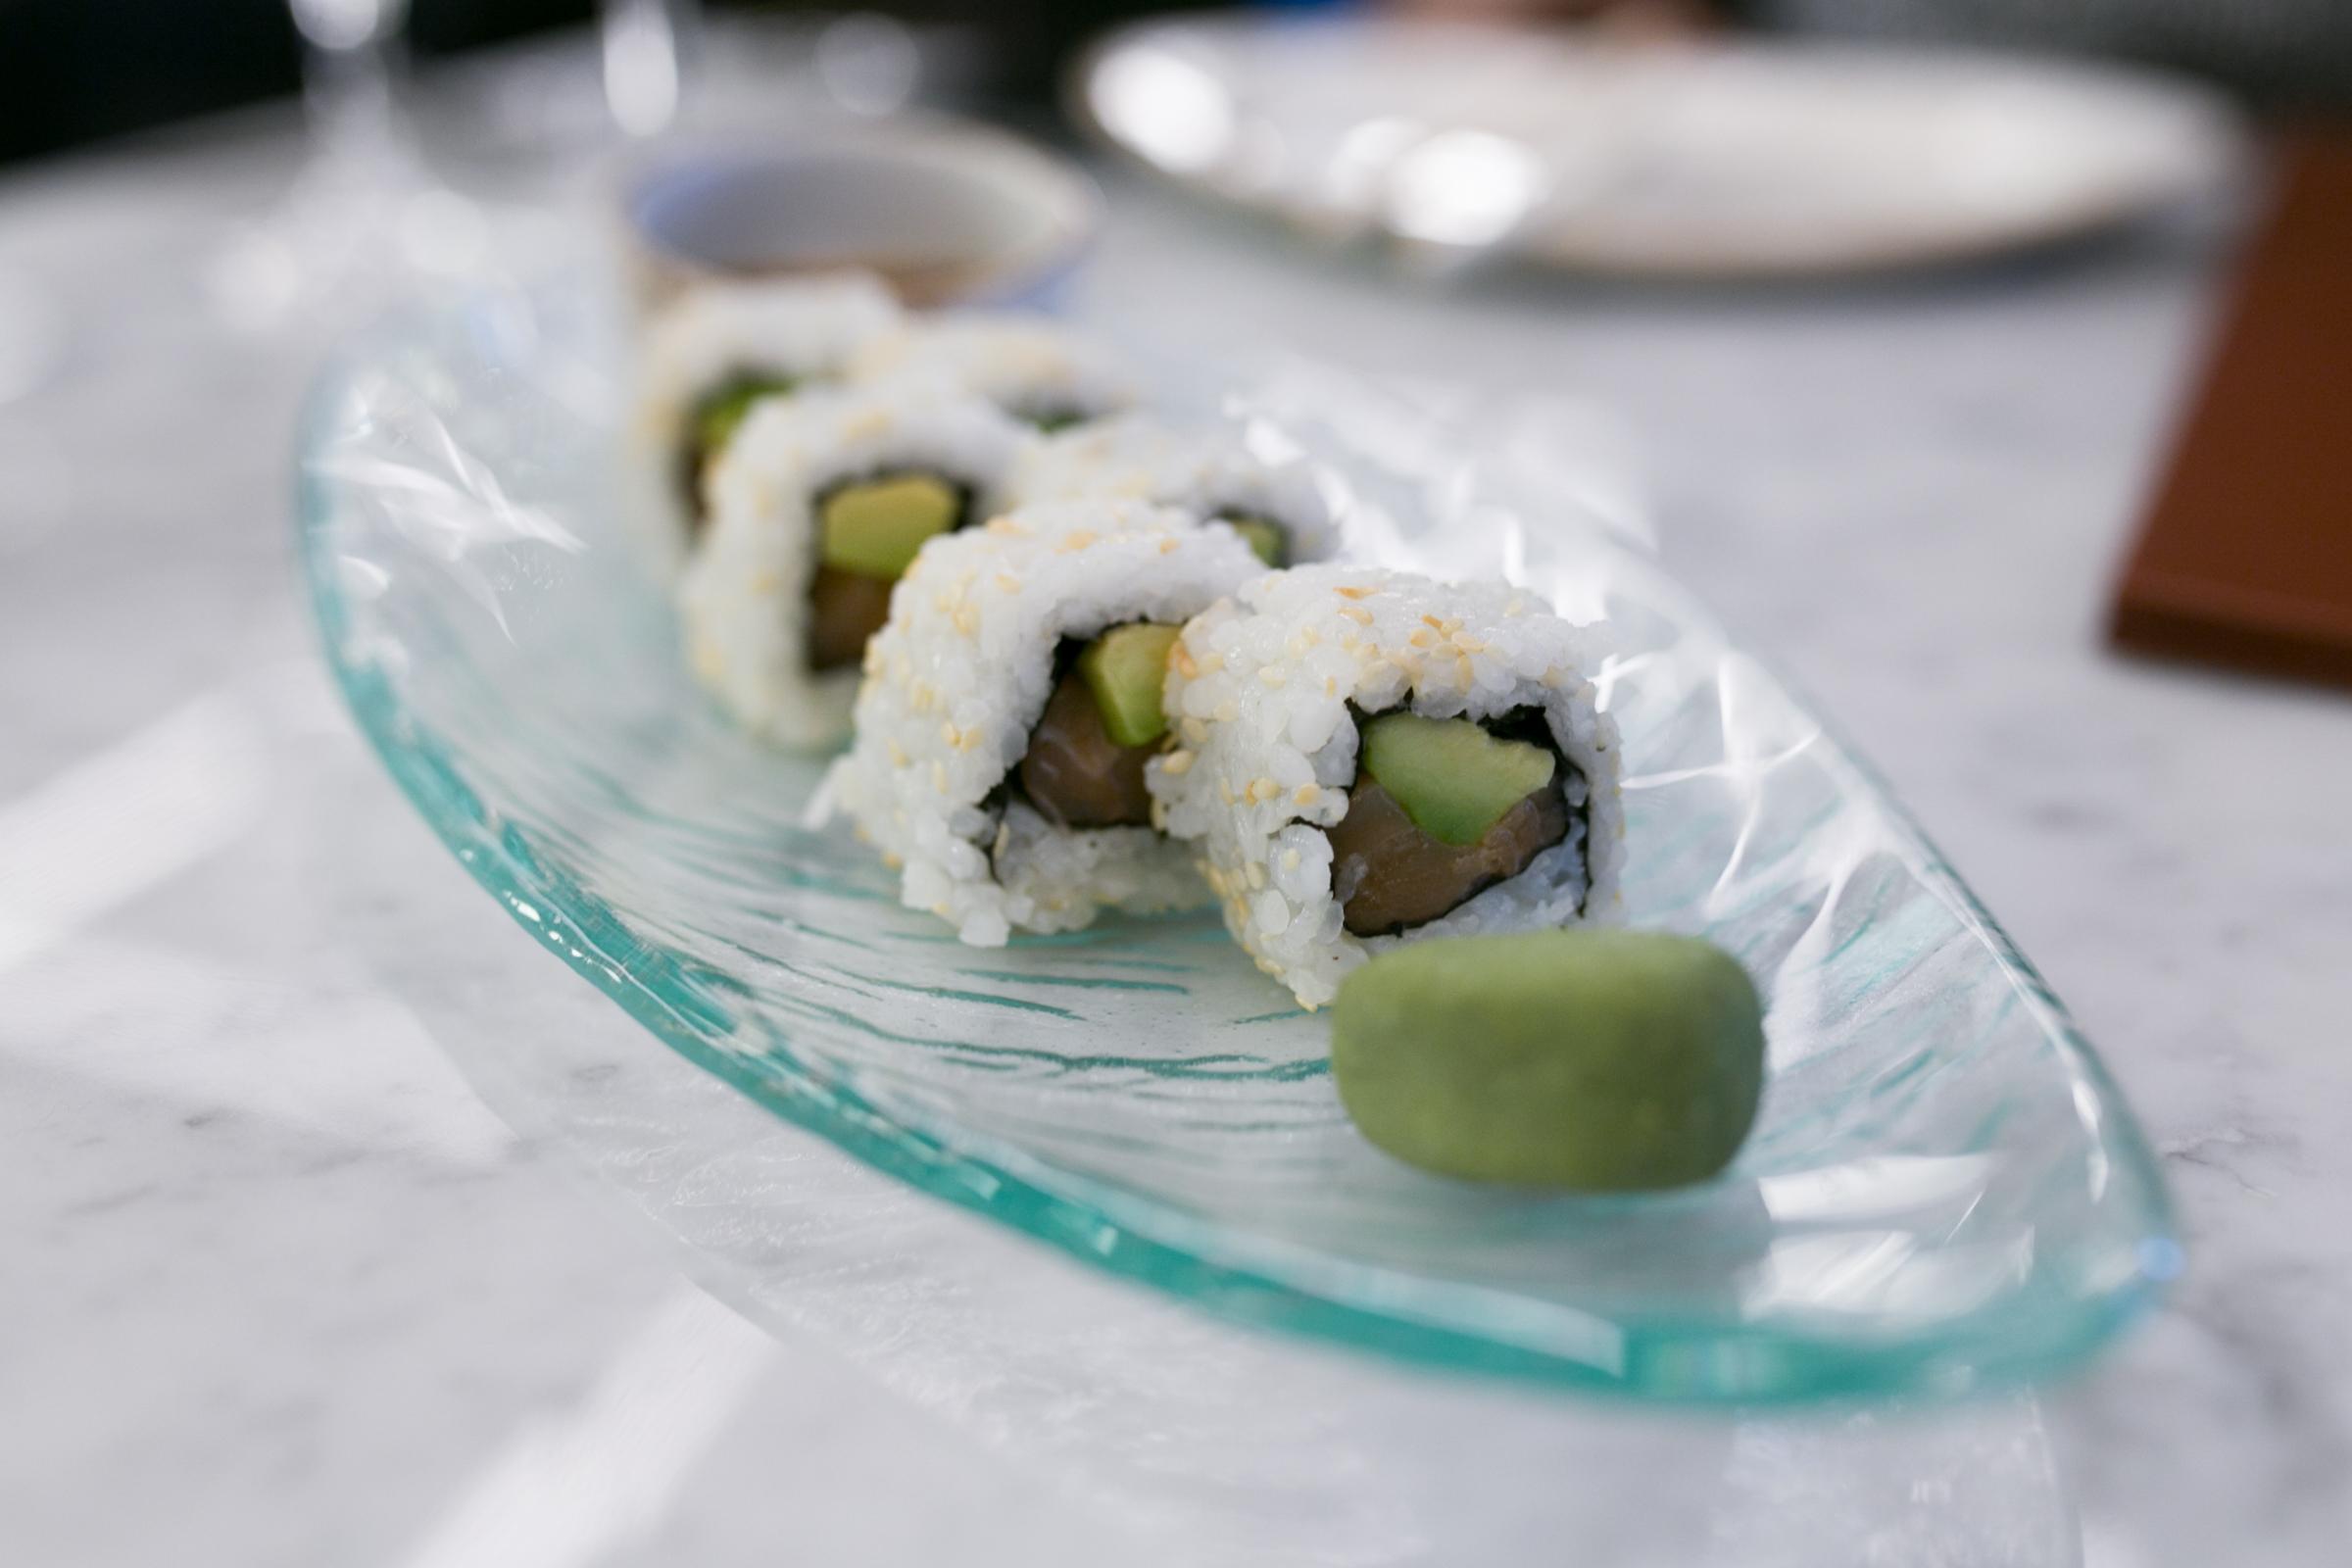 Caramel-restaurant-and-lounge-london-abu-dabi-dubai-oman-new-restaurant-in-london-minas-planet-review-jasmina-haskovic10.jpg